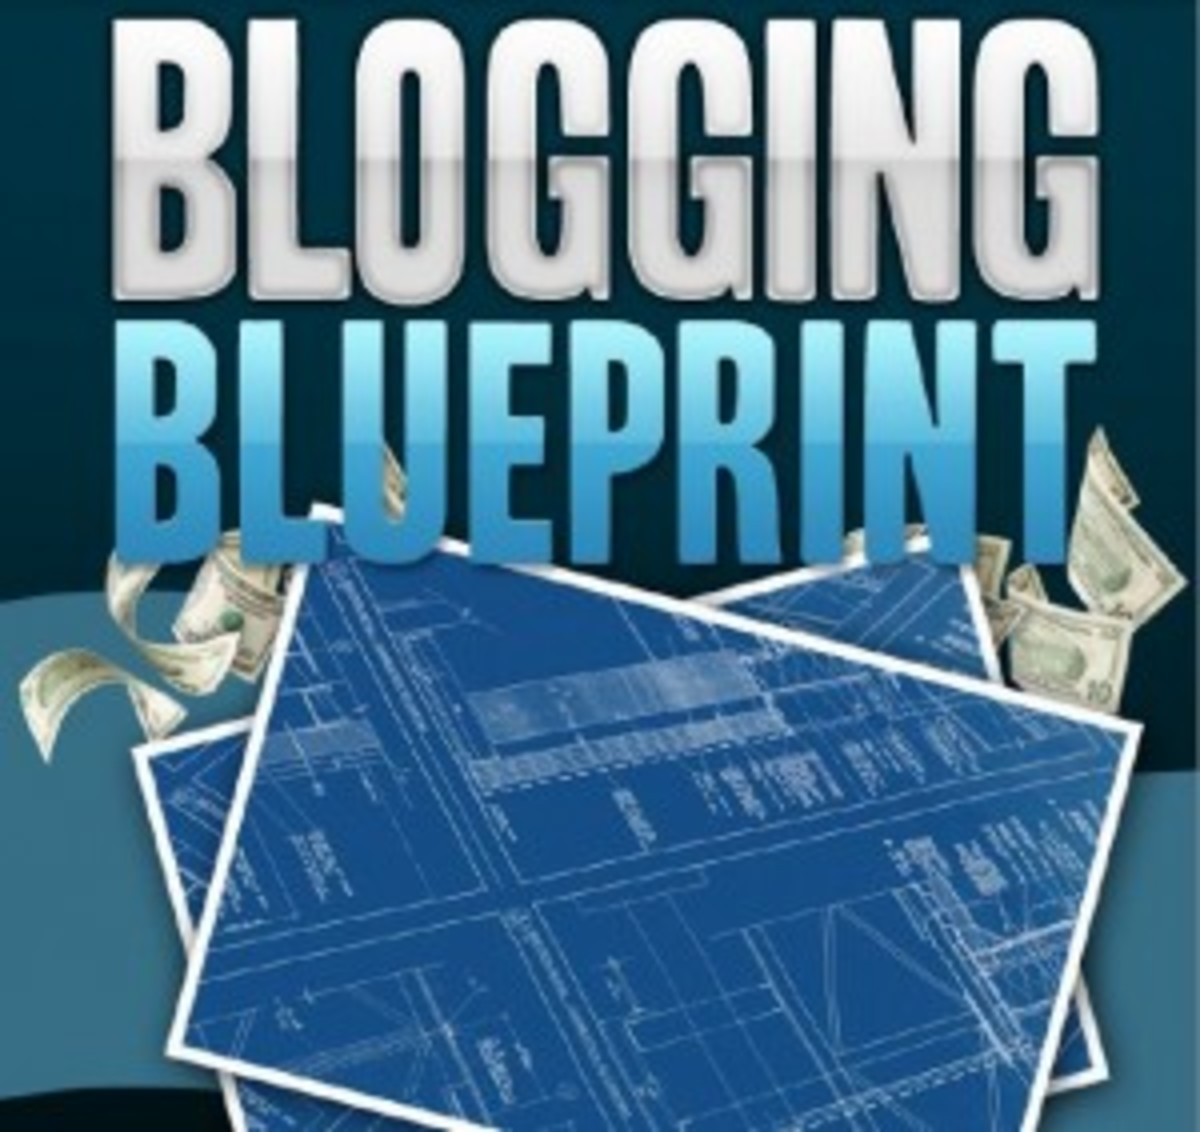 Blogging-Blueprint-640x604-300x283